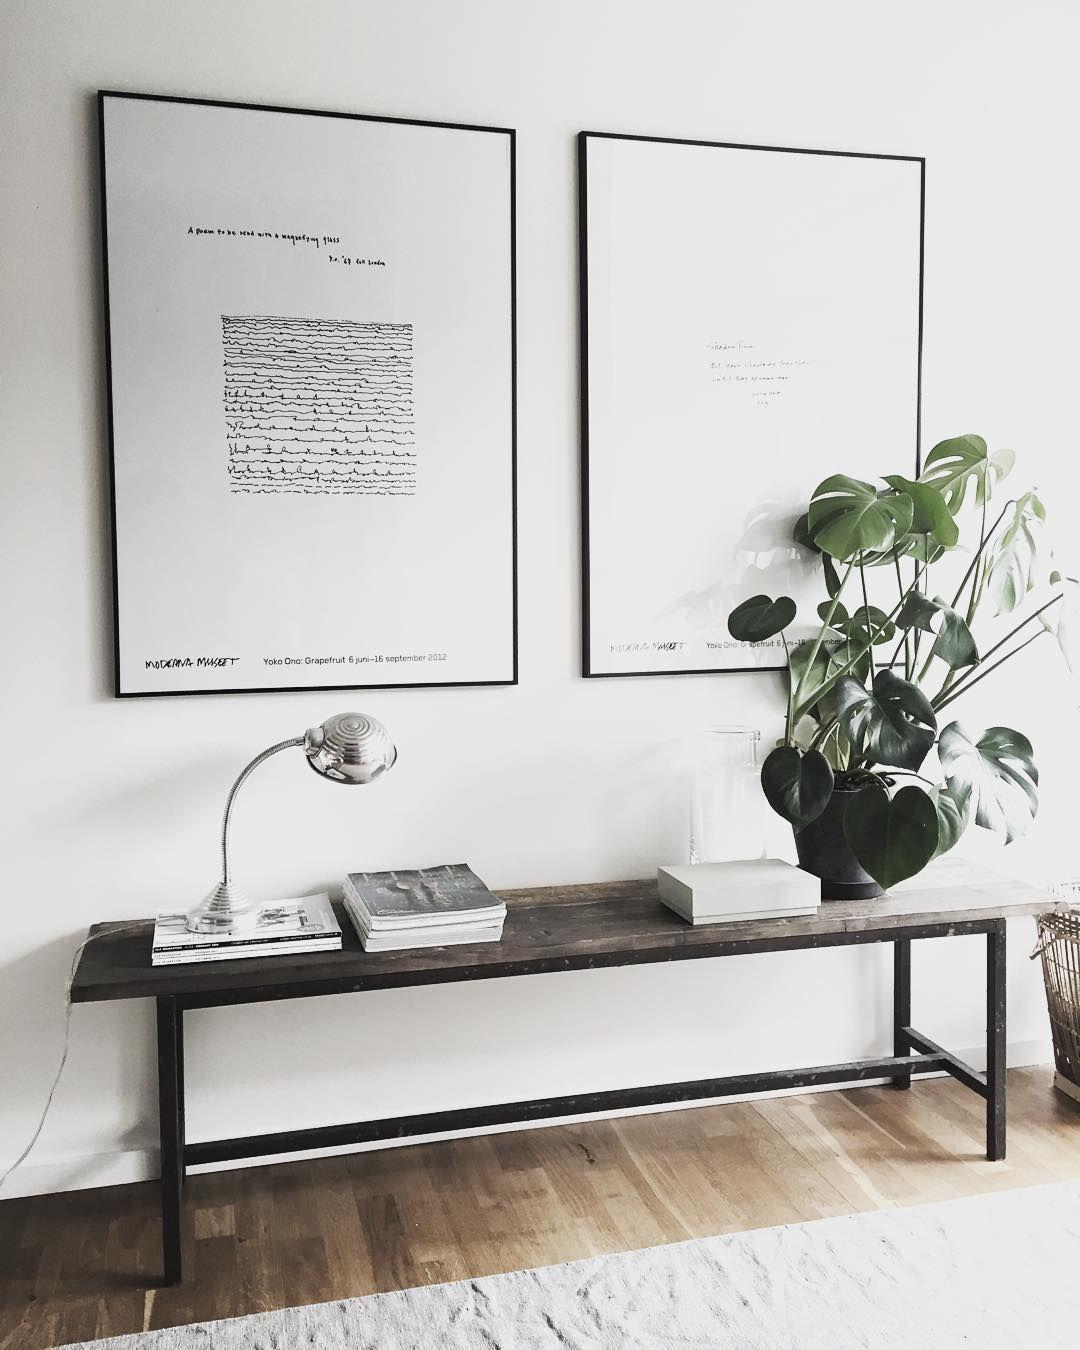 Wohnideen Instagram via studiocuvier on instagram http ift tt 1kvtd4e hallways